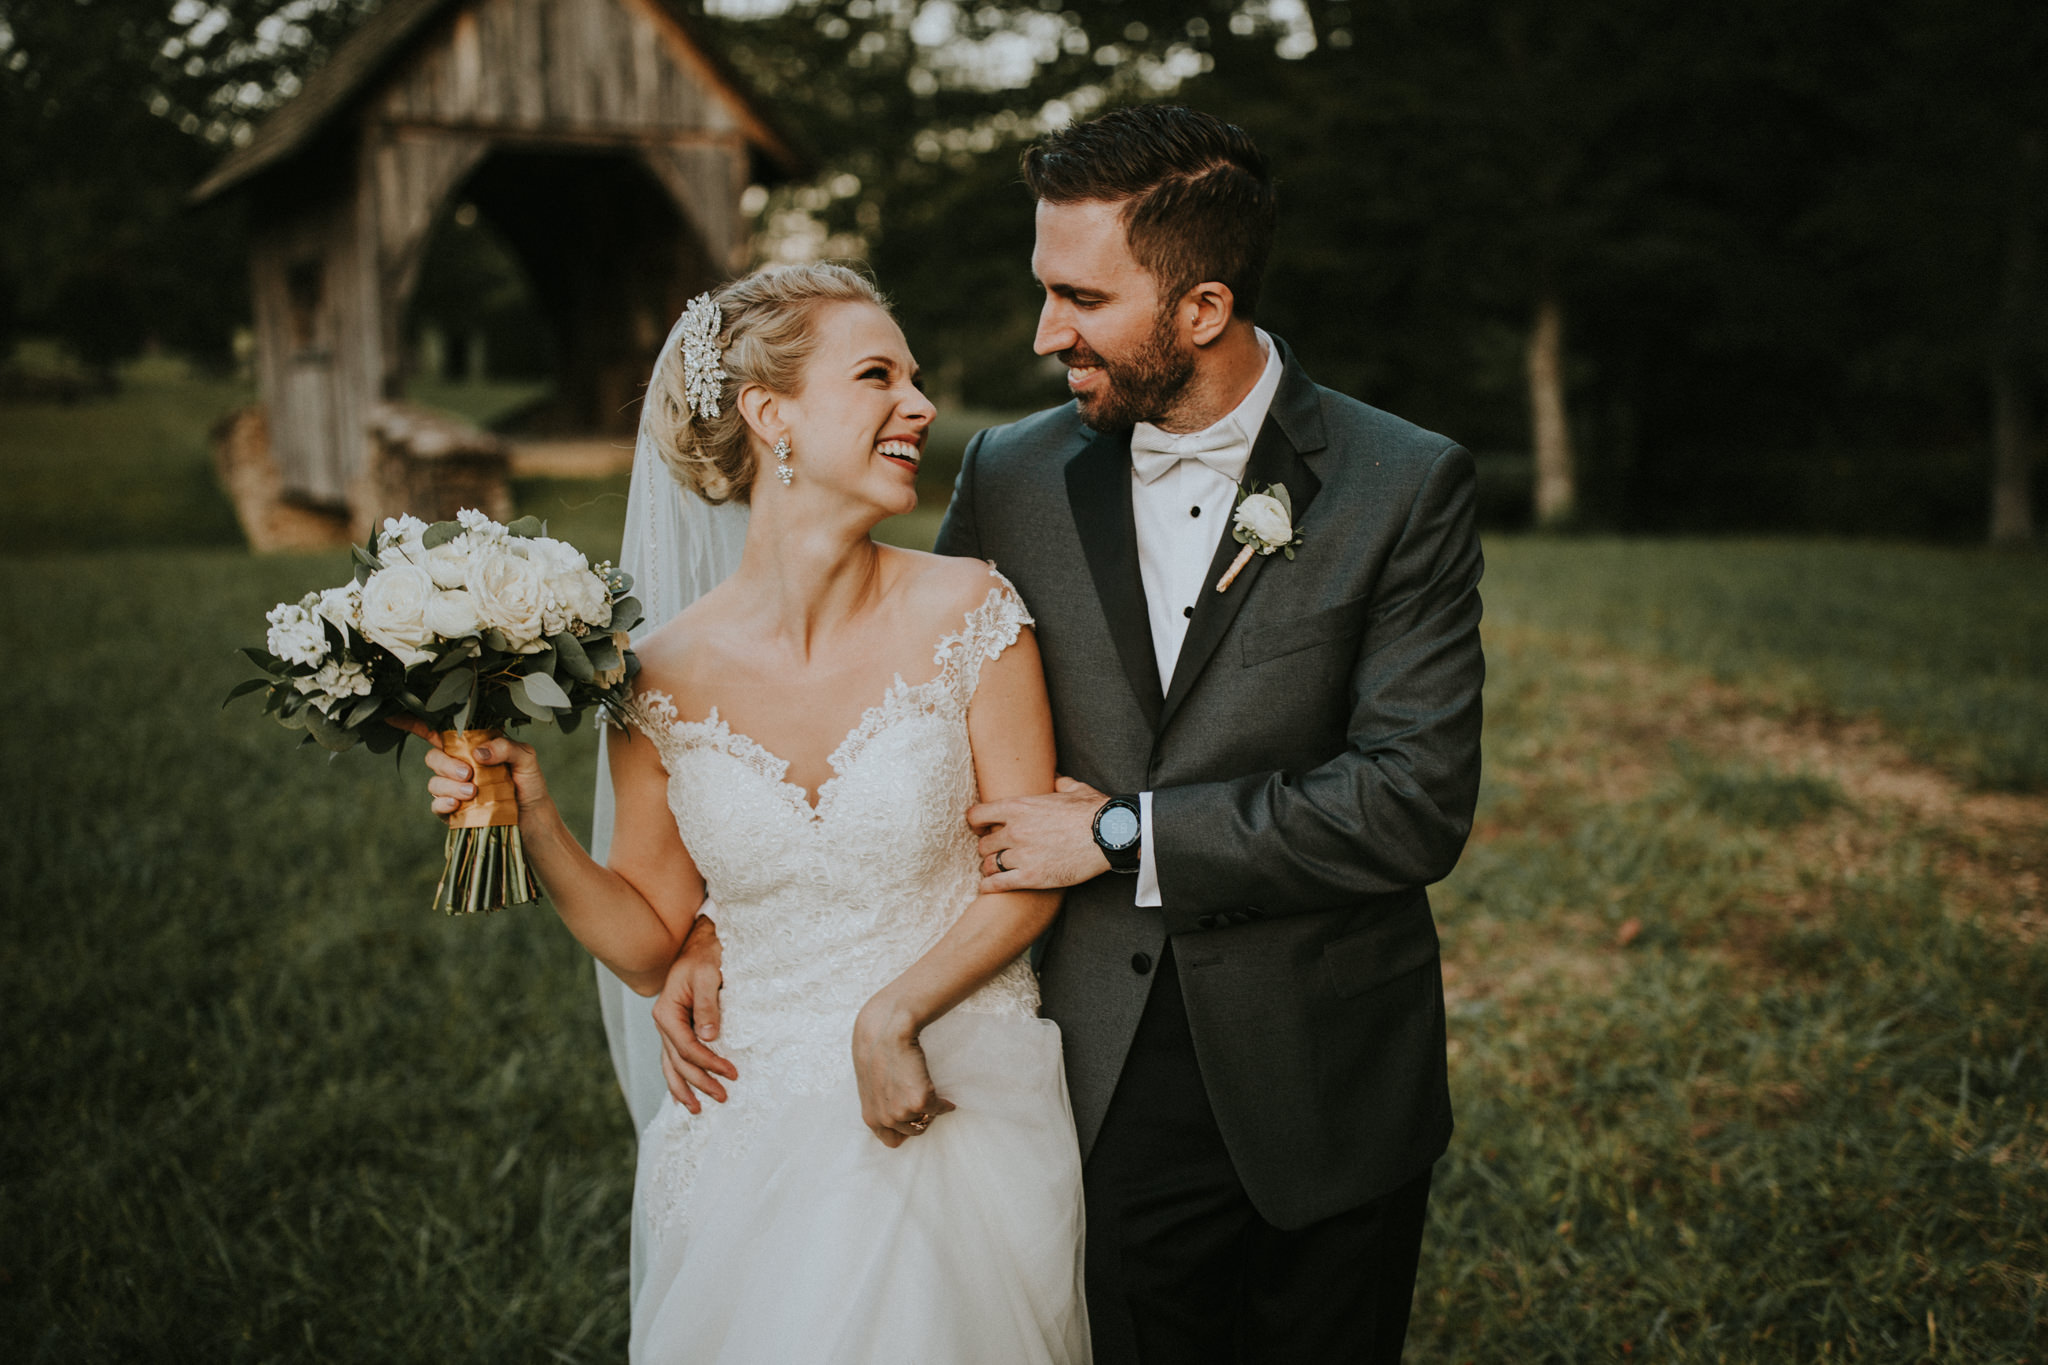 Wedding Photographer Fairbanks